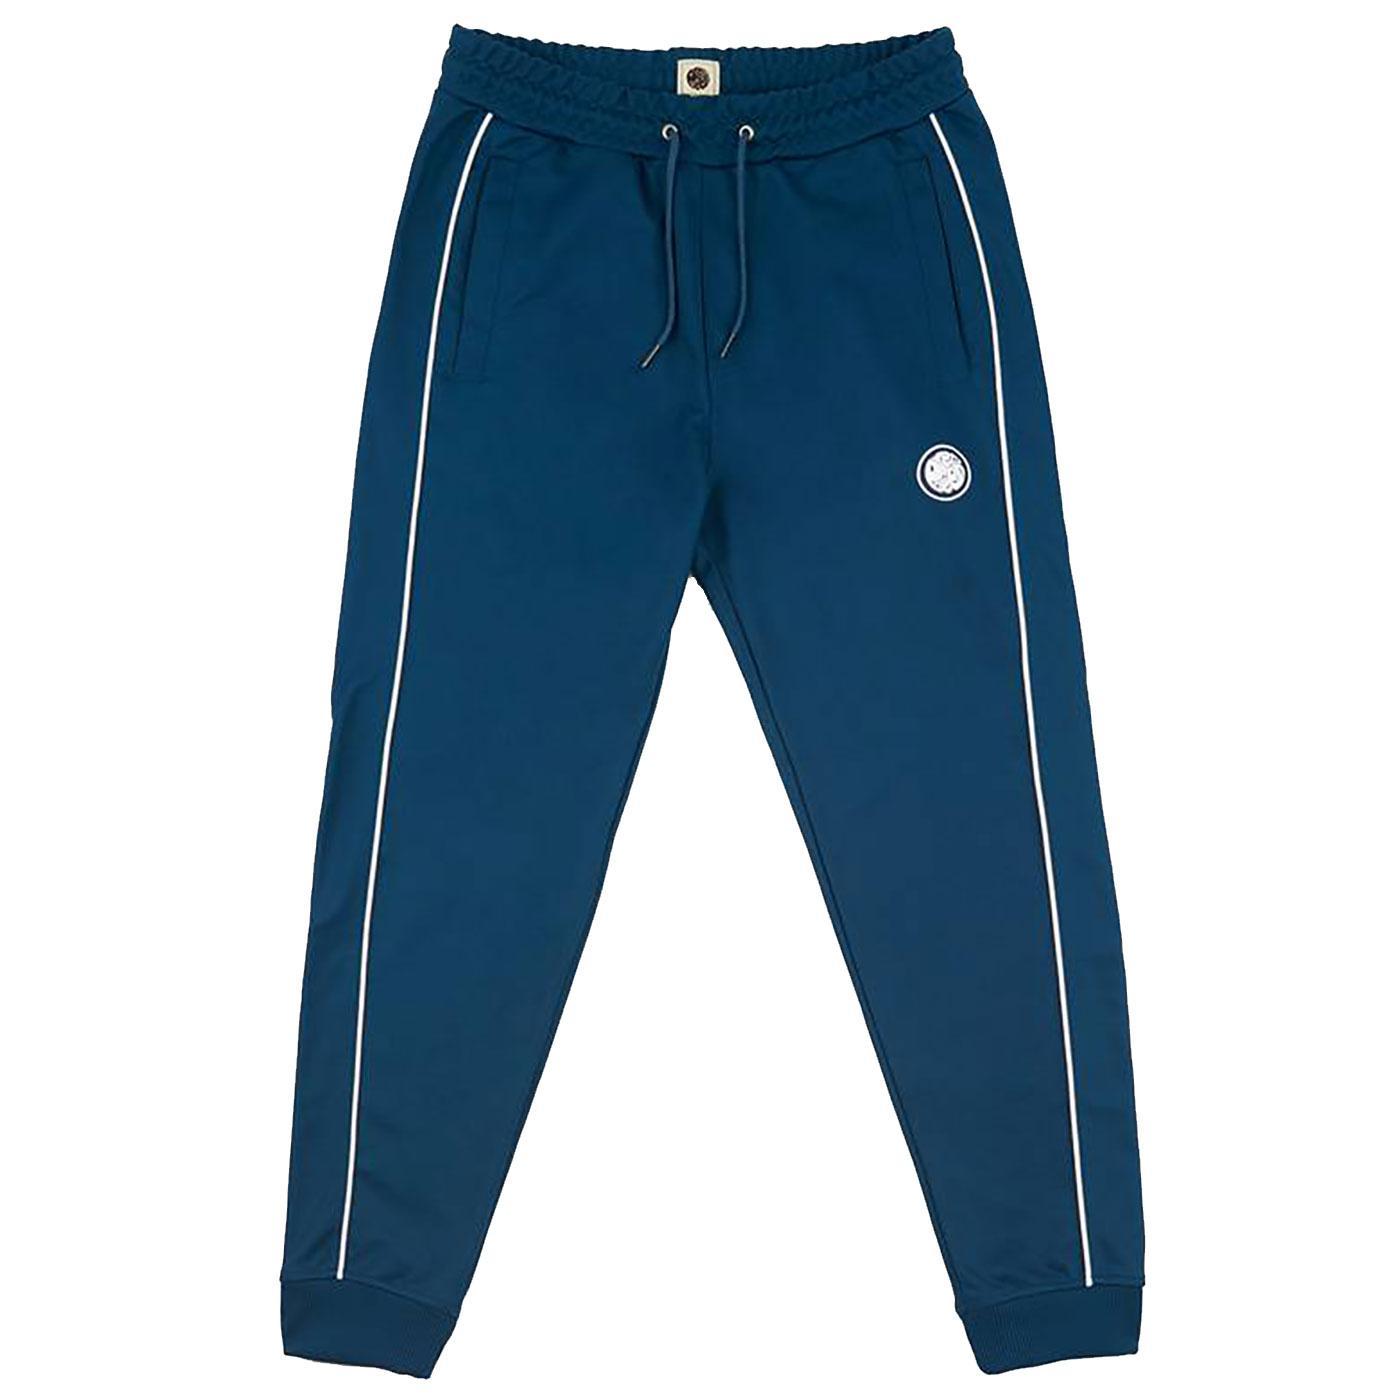 PRETTY GREEN Men's Contrast Piping Track Pants B